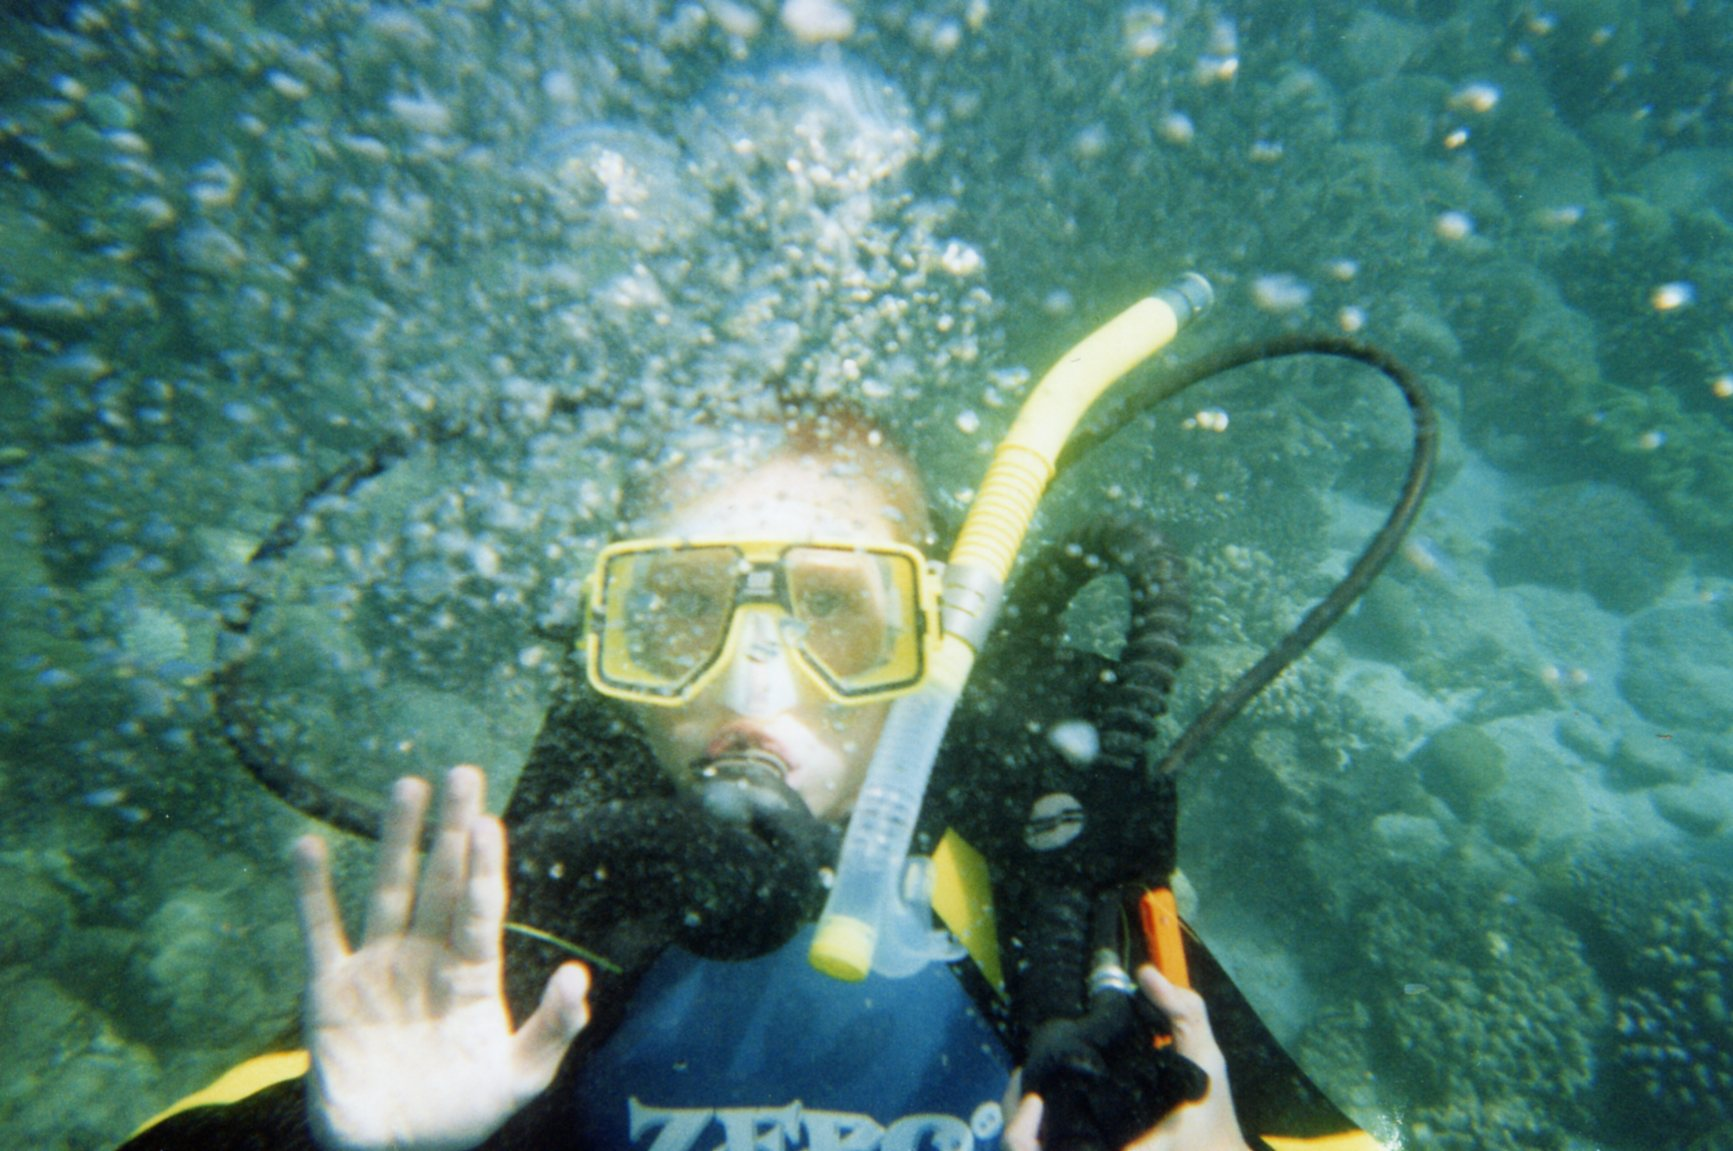 The underwater talker